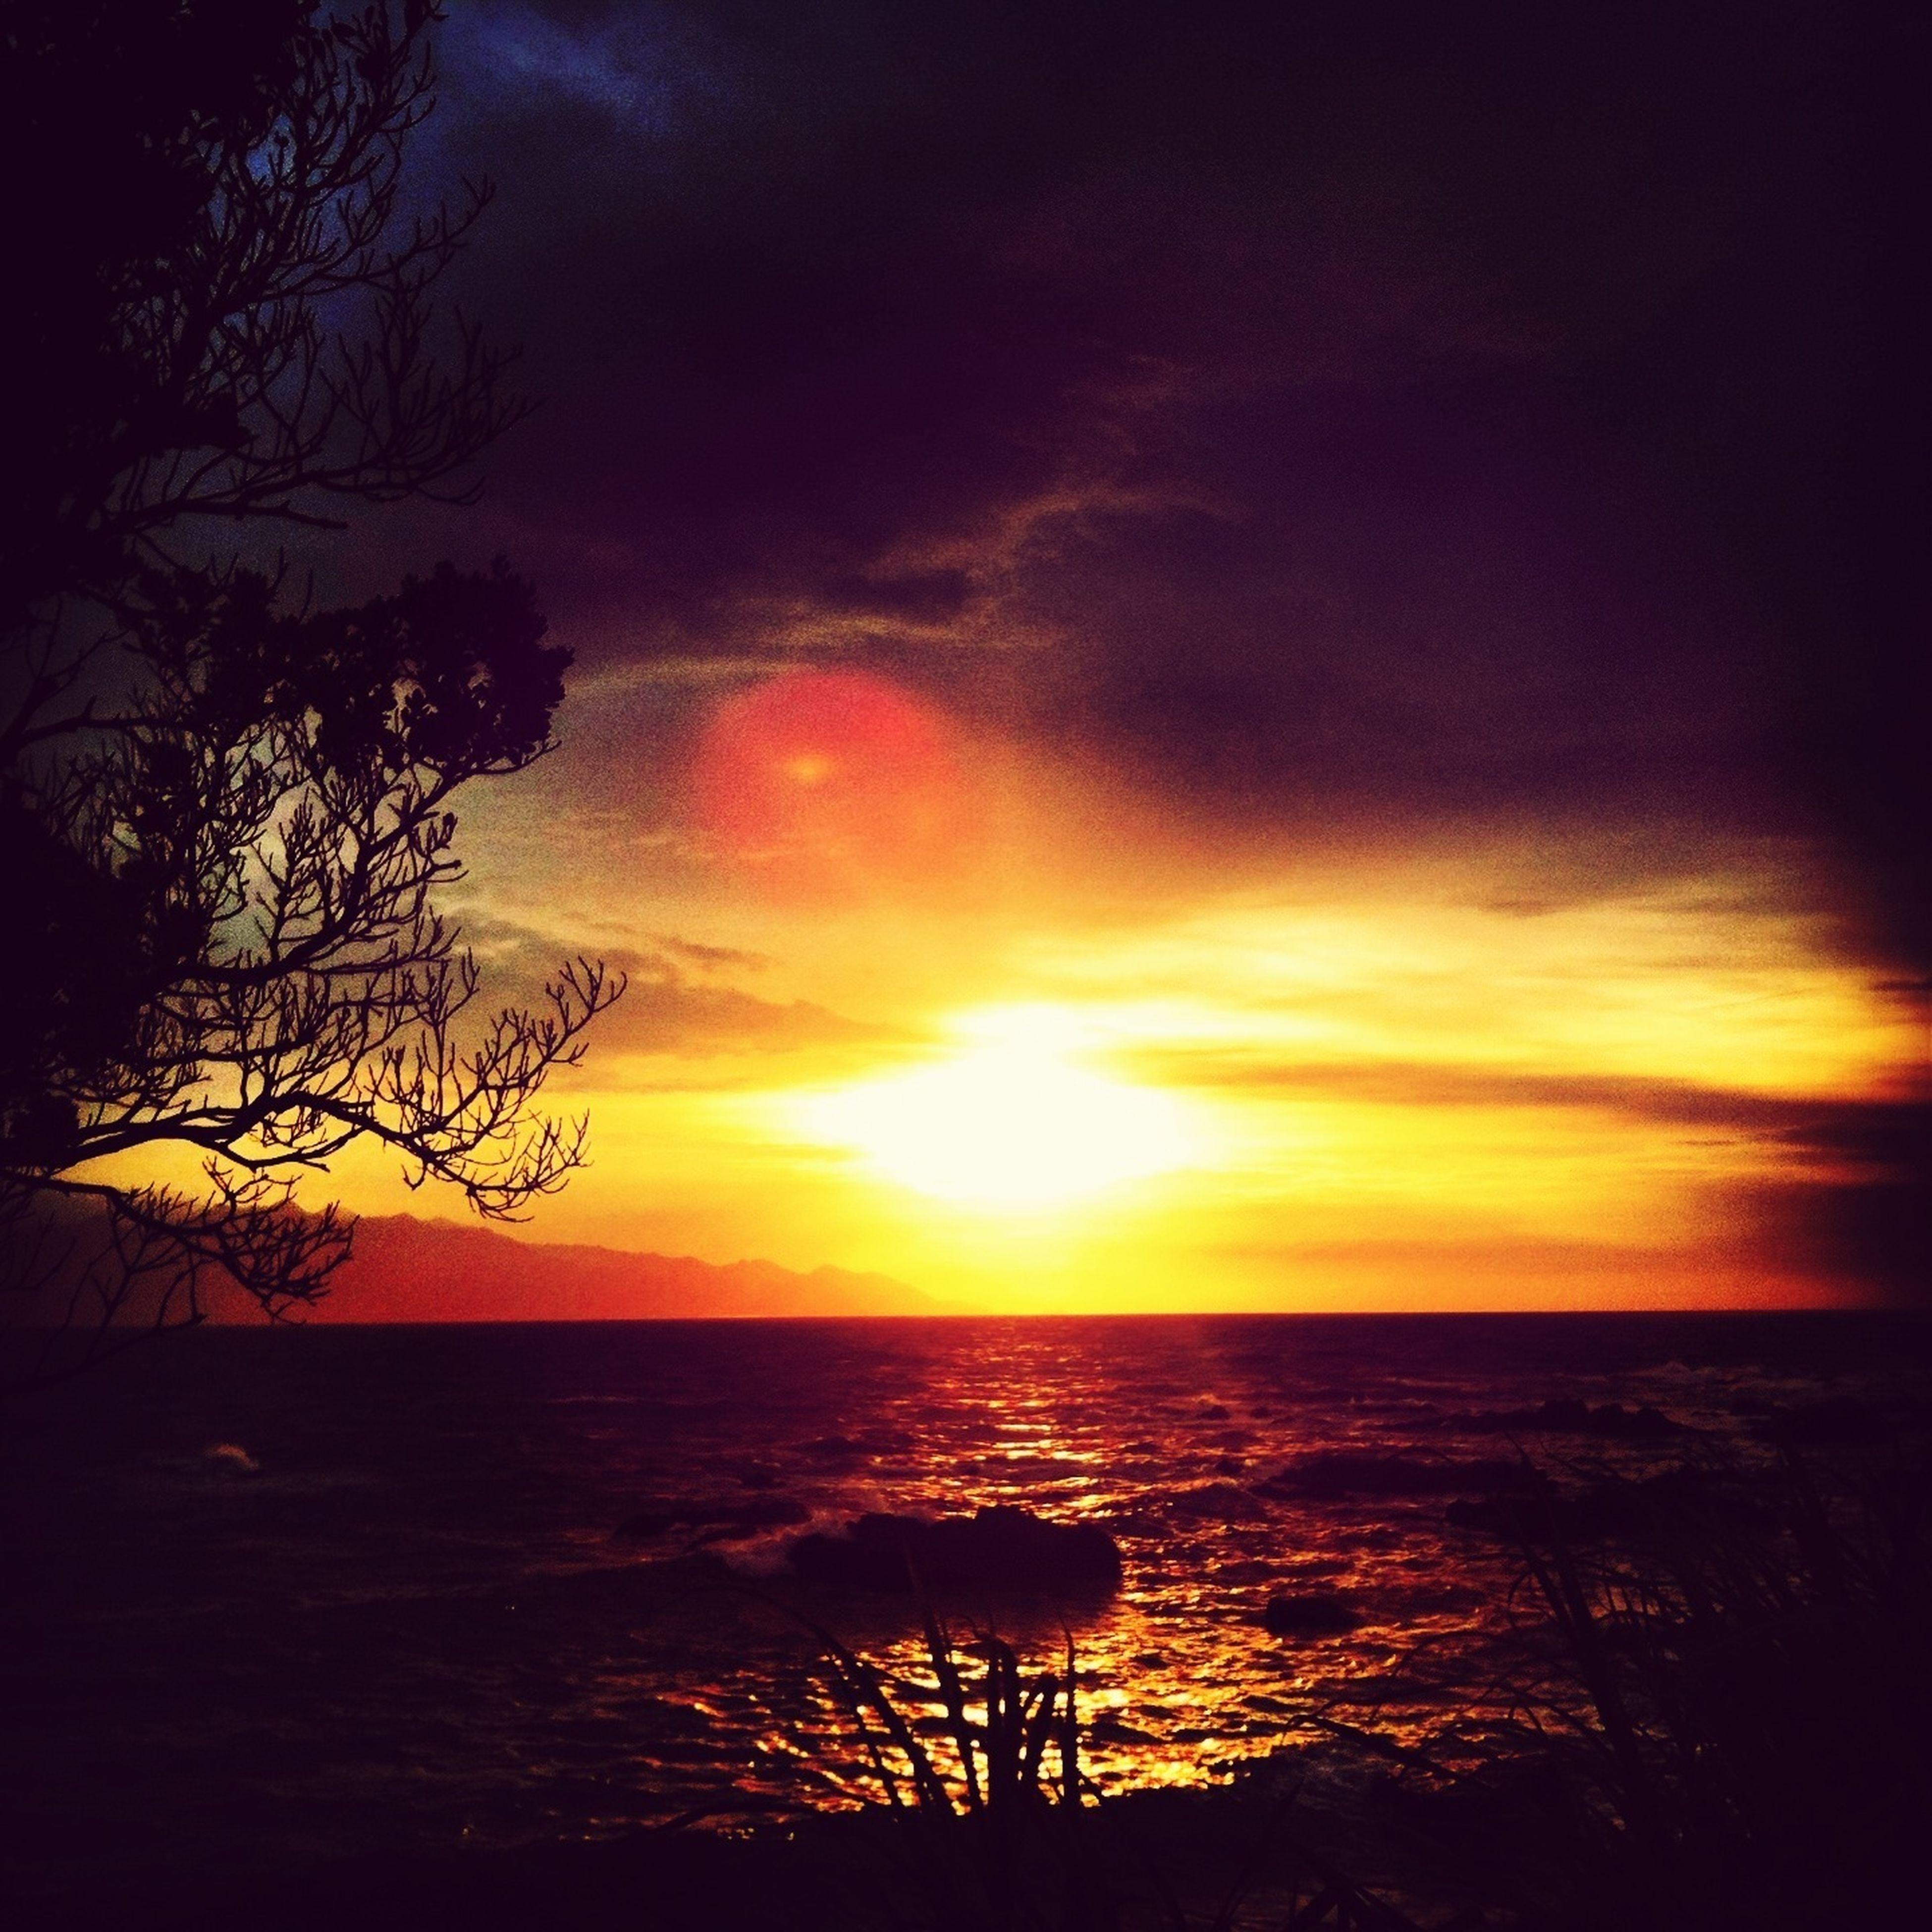 Sunset #sun #clouds #skylovers #sky #nature #beautifulinnature #naturalbeauty #photography #landscape Sun_collection, Sky_collection, Cloudporn, Skyporn Summertime 向こうに見えるのは屋久島(ت)